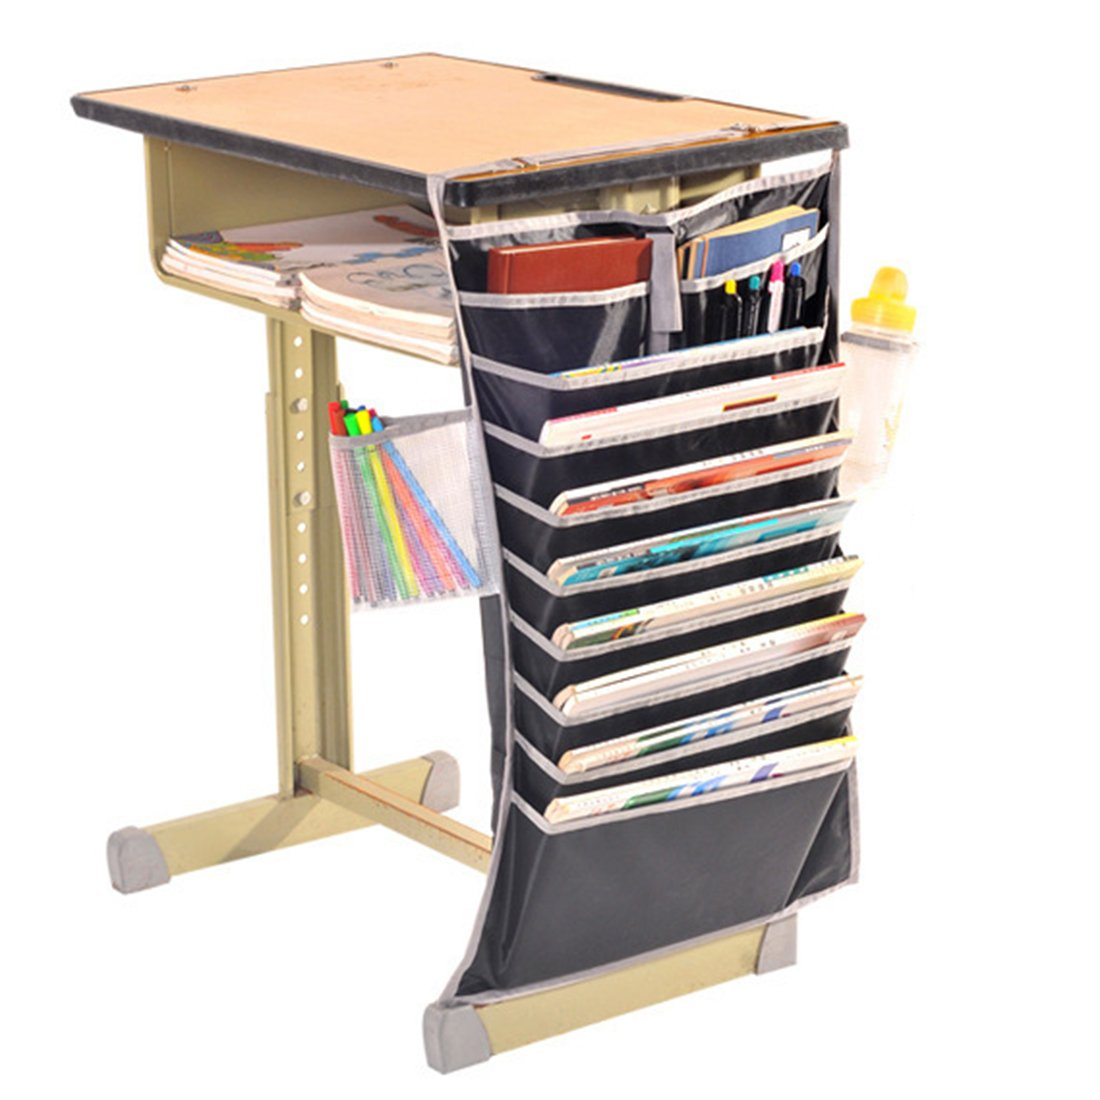 Katoot@ Thicken Student Desktop Hanging Storage Bag Home Adjustable Book Sundaries Bag Holder Organizer (Black)